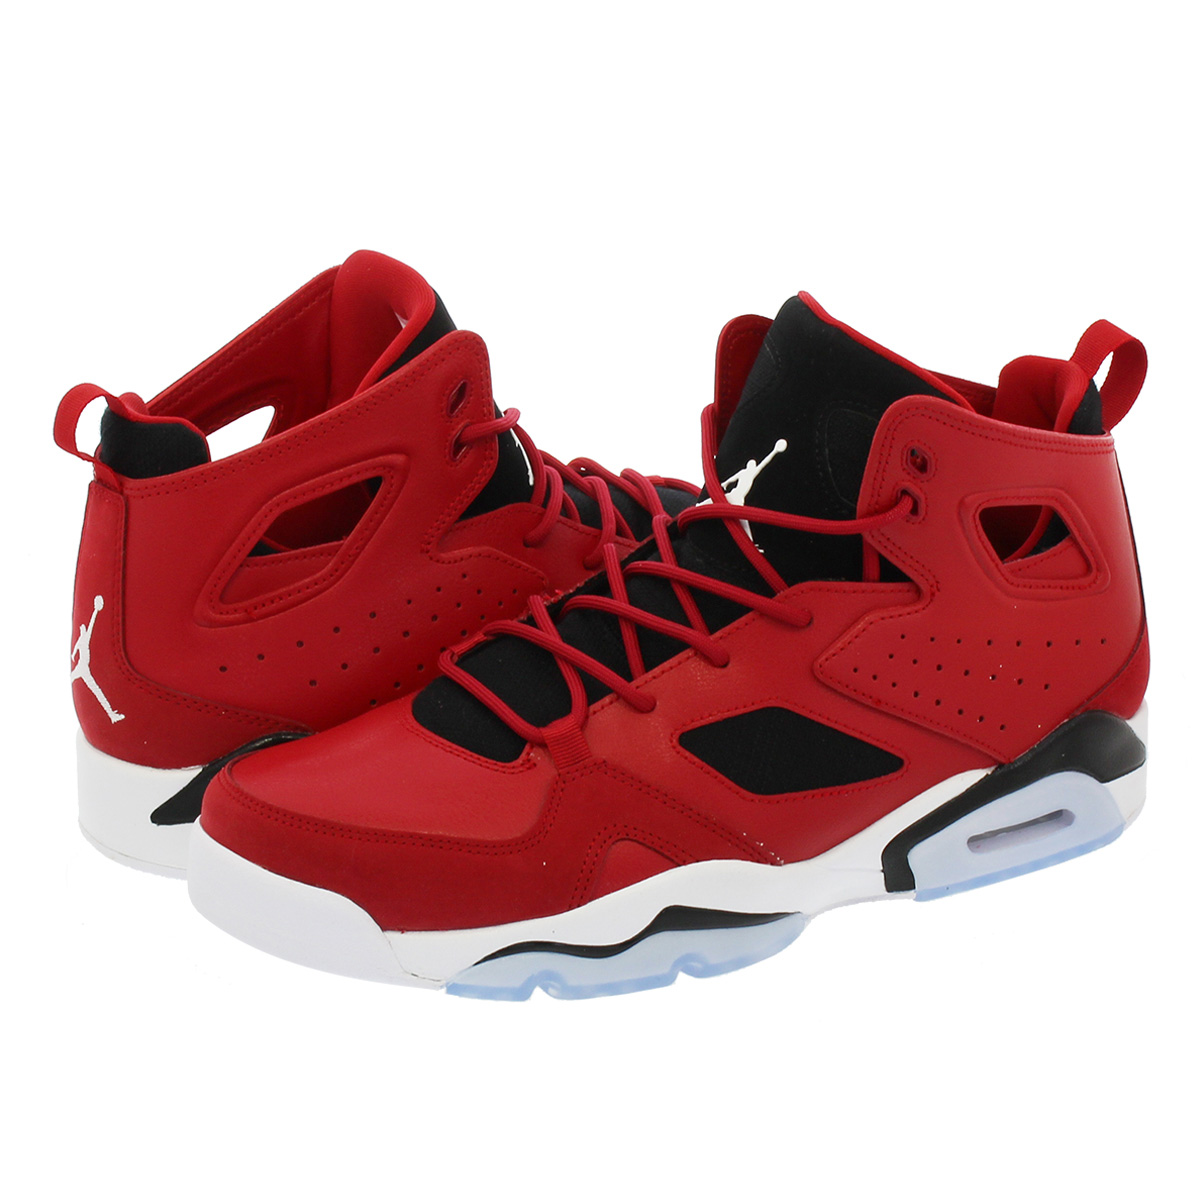 c8d0cd48b3349e NIKE JORDAN FLIGHT CLUB 91 Nike Jordan flight club 91 GYM RED BLACK WHITE